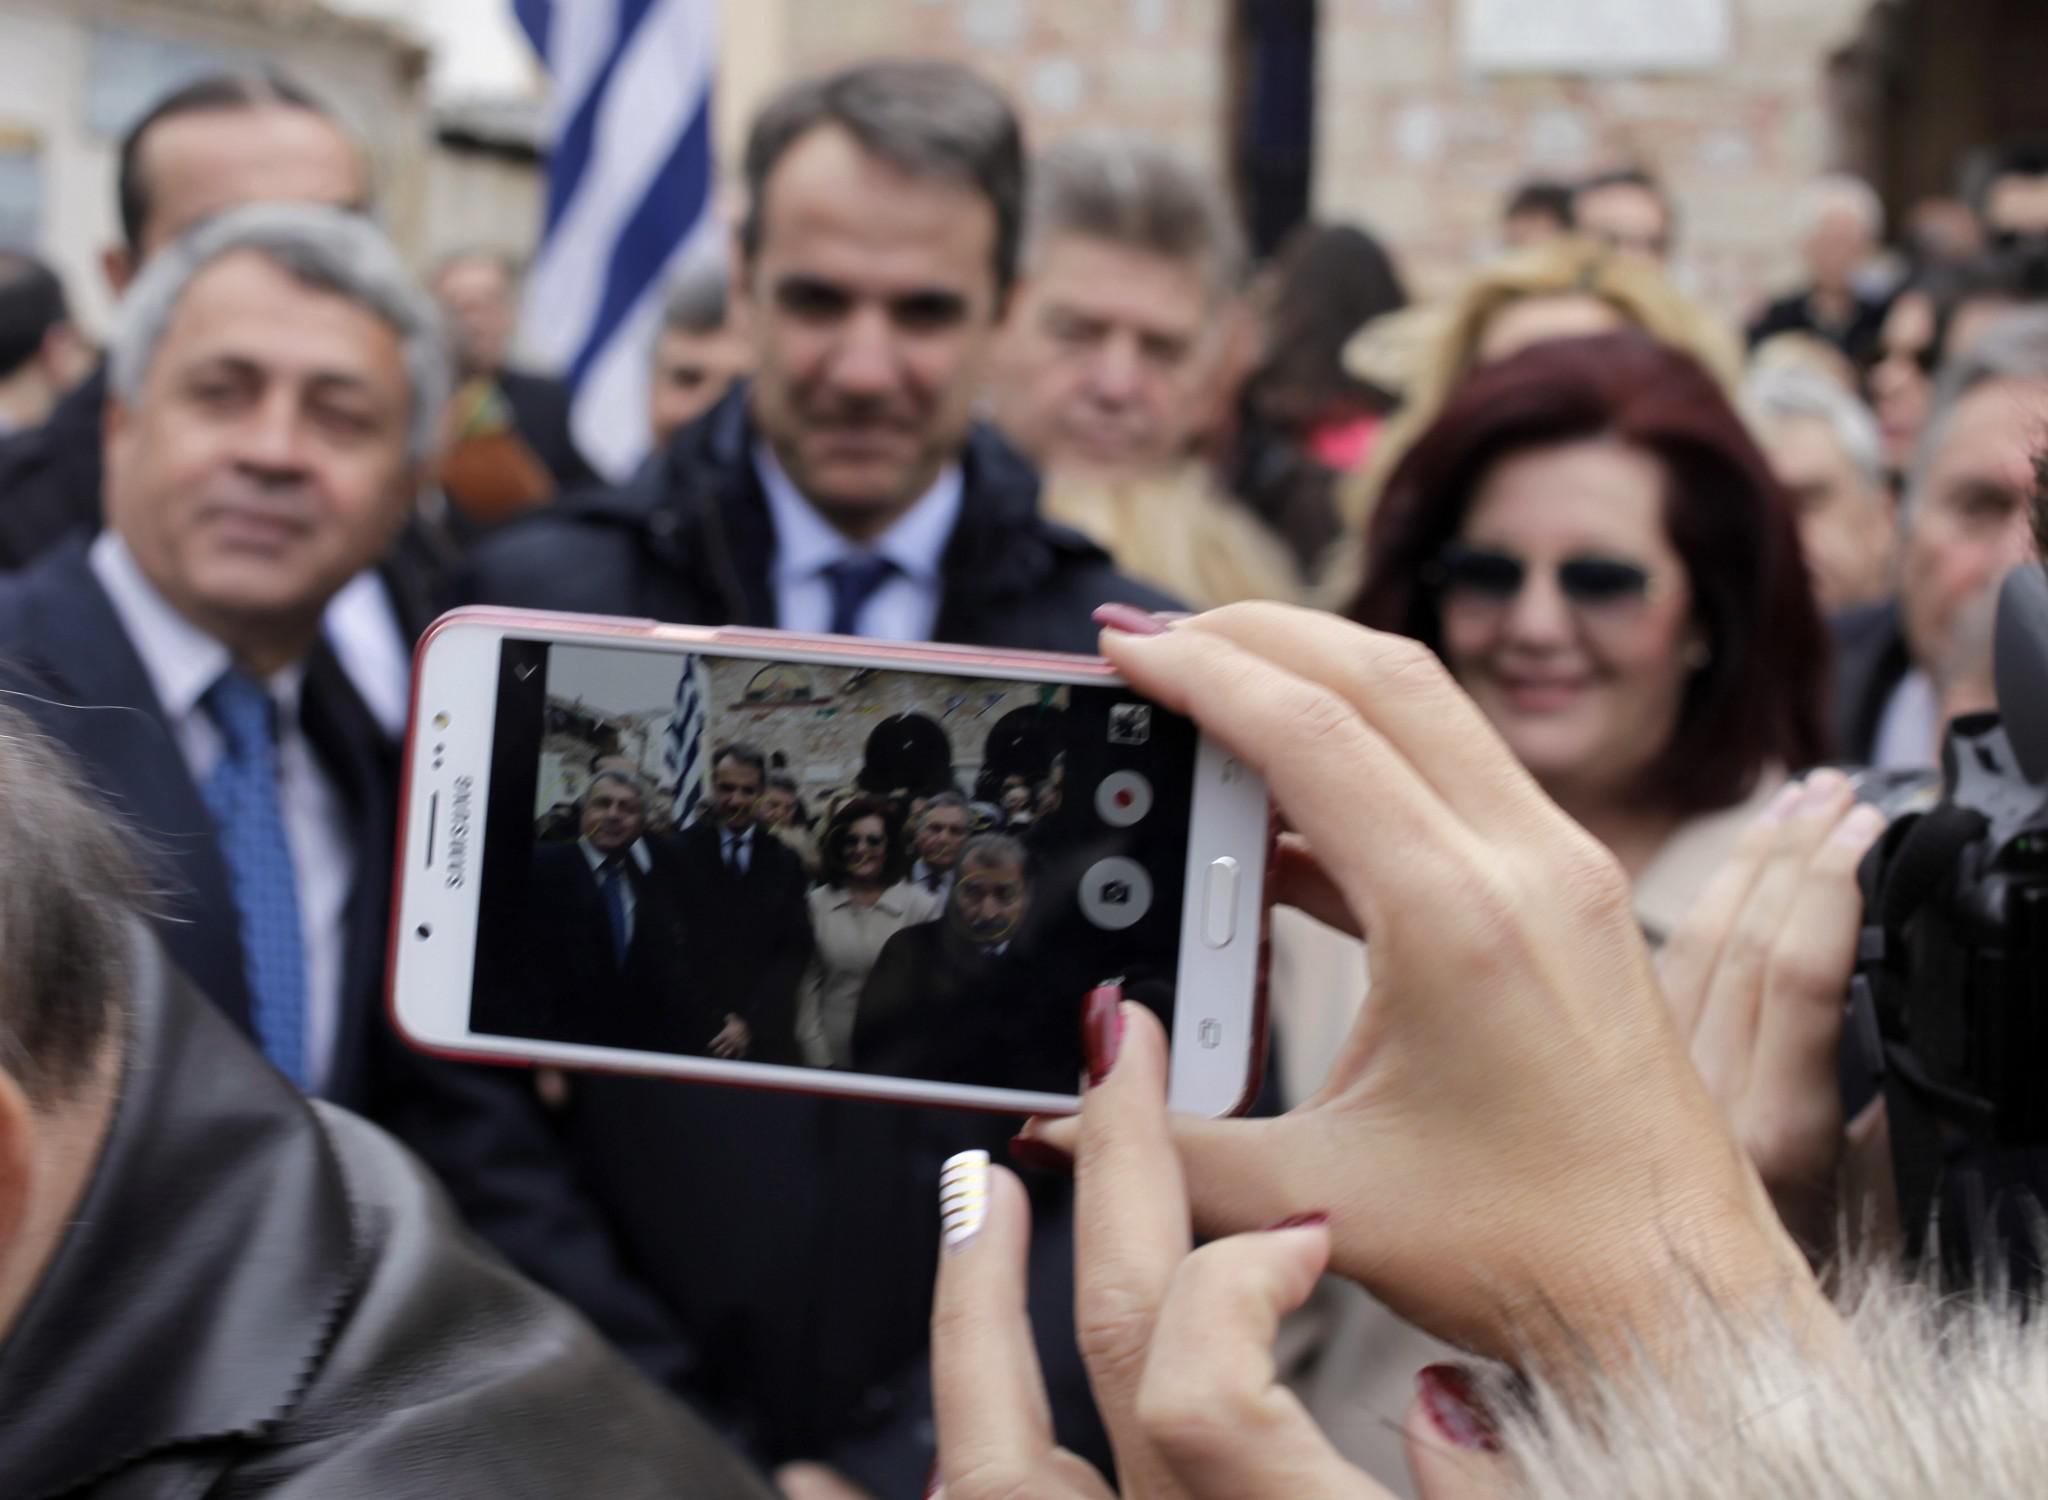 mitsotakis2-500 Μητσοτάκης: Είναι άμεση η ανάγκη για ενότητα [εικόνες]